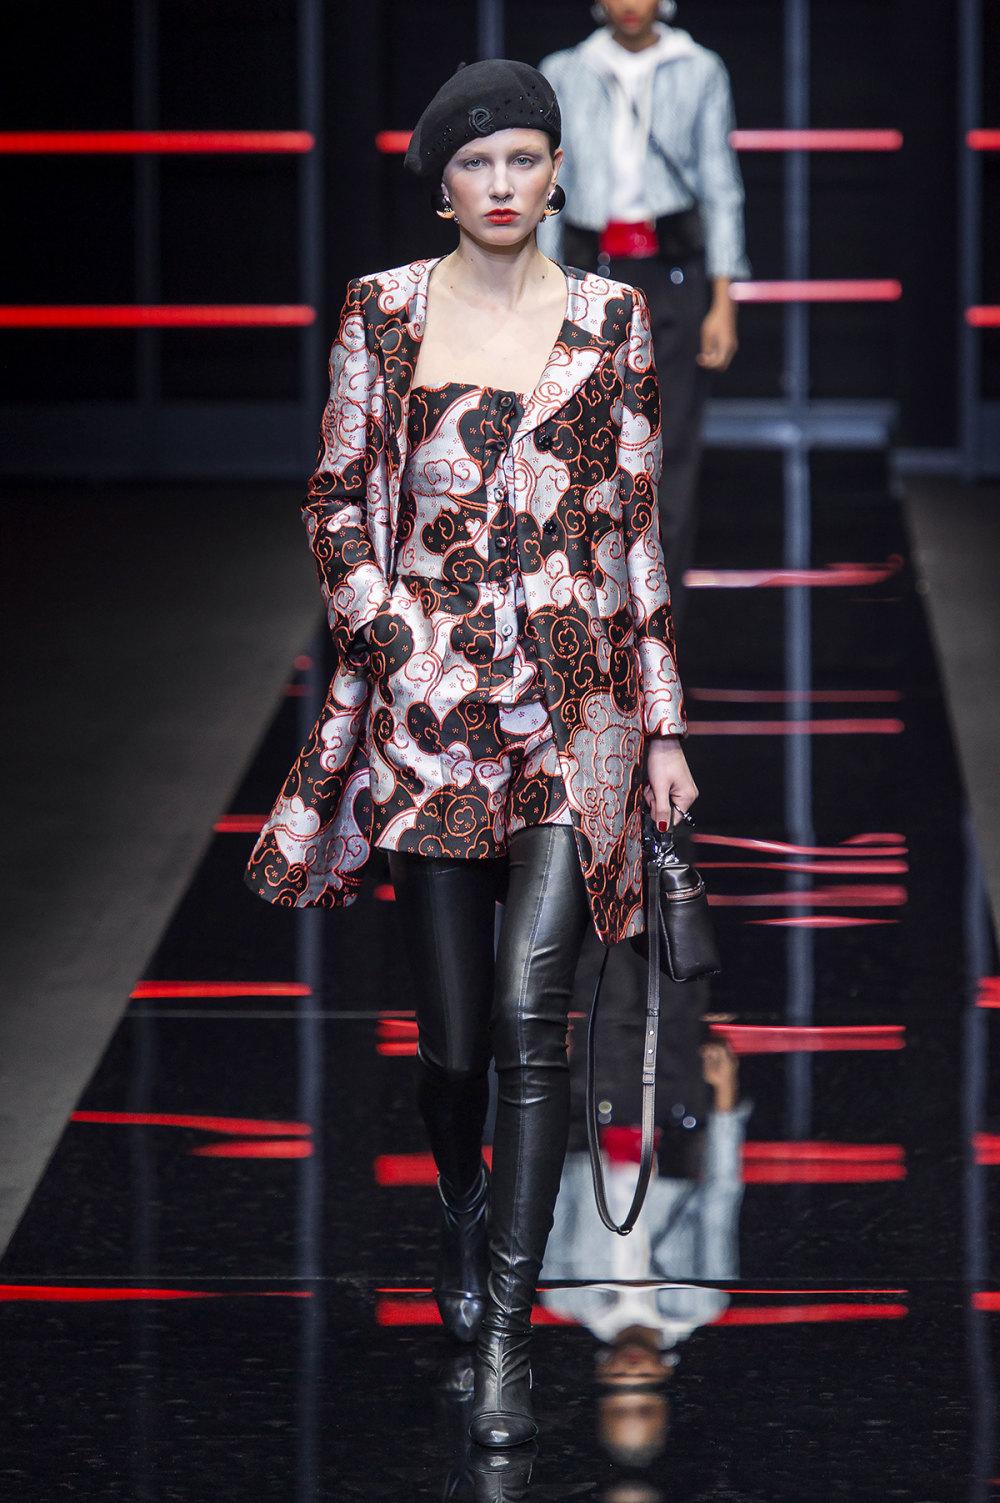 Emporio Armani时装系列畅的裤子带有柔滑裙子的鸡尾酒礼服-18.jpg